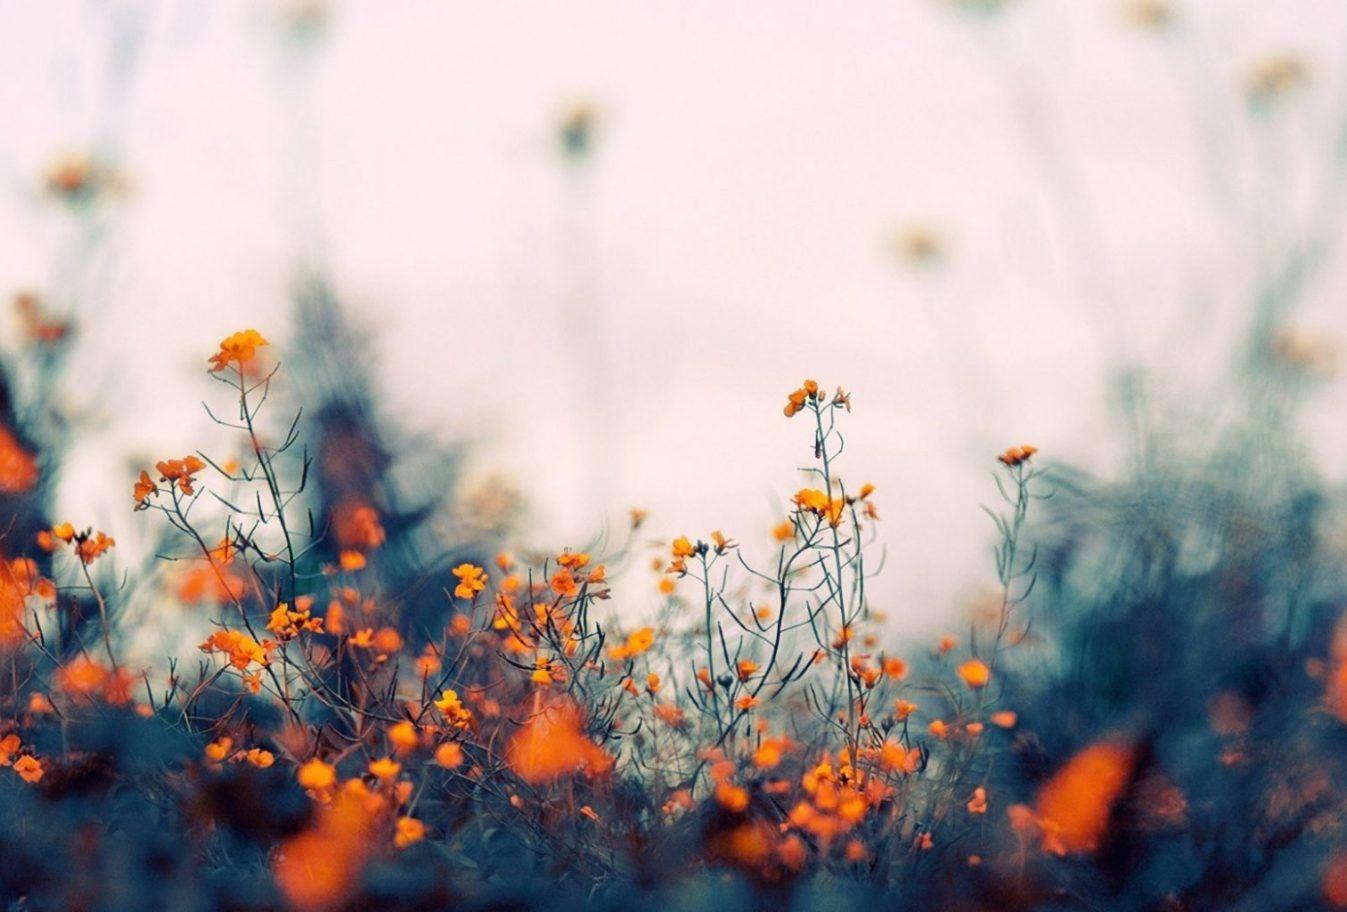 Macbook Wallpaper Hd Flowers